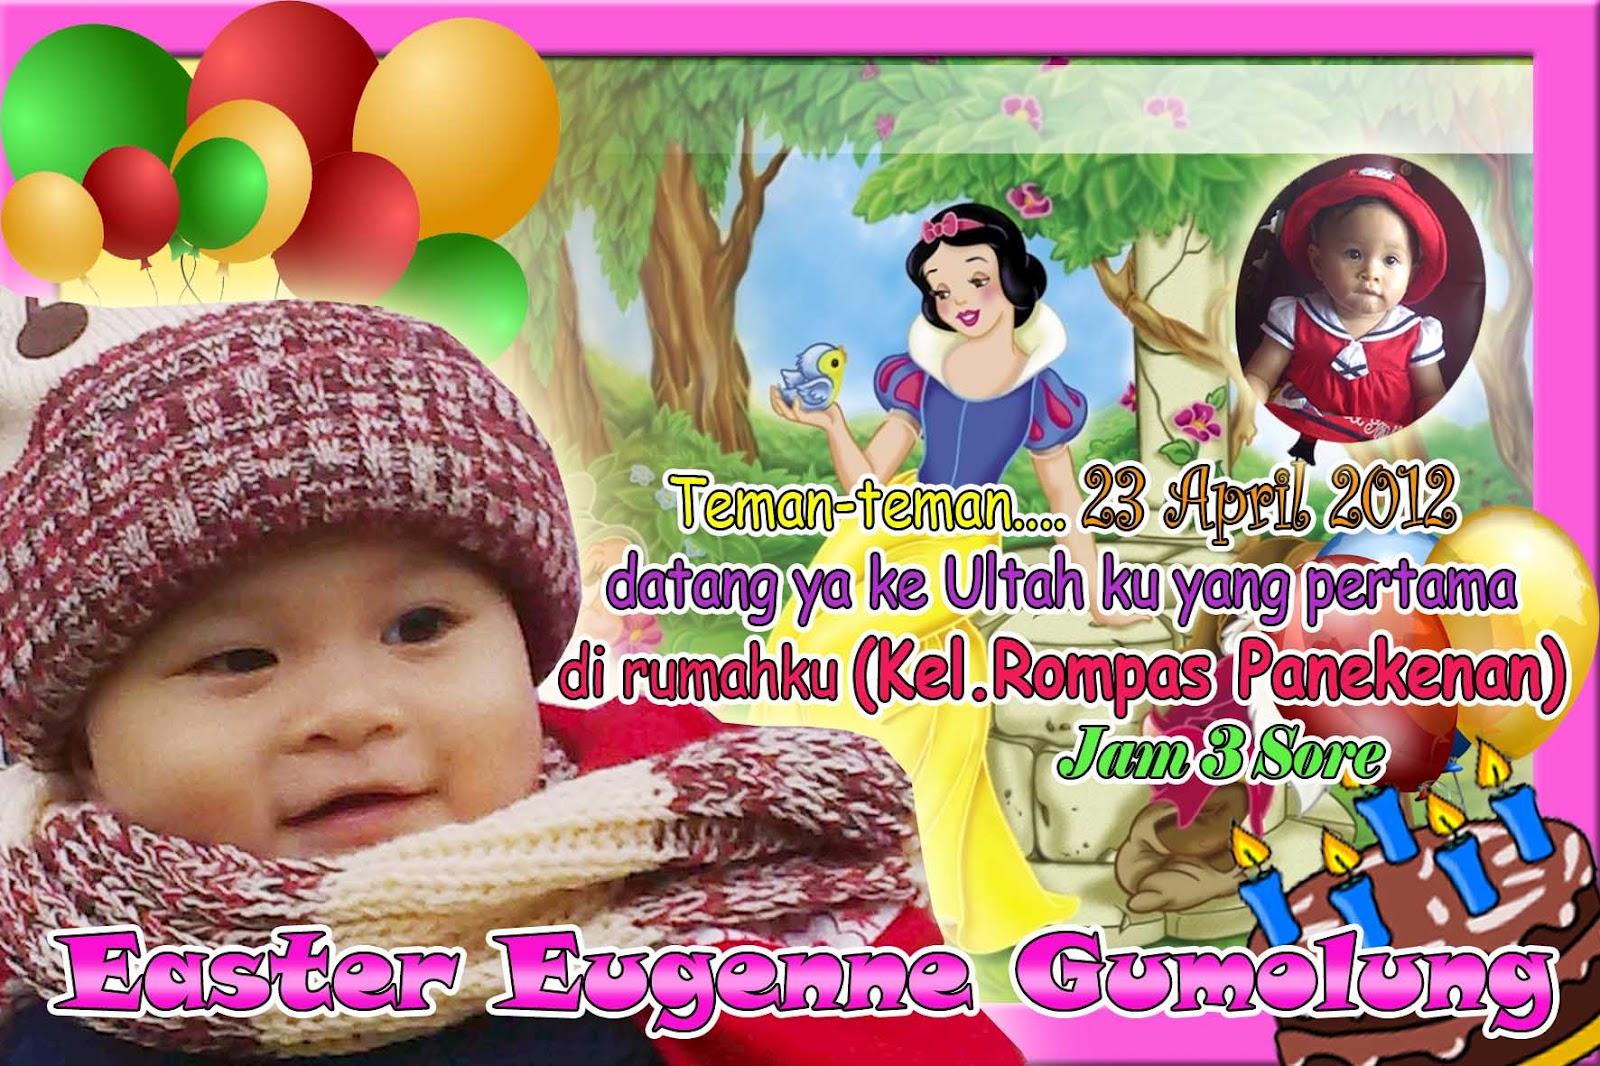 free download undangan ulang tahun anak